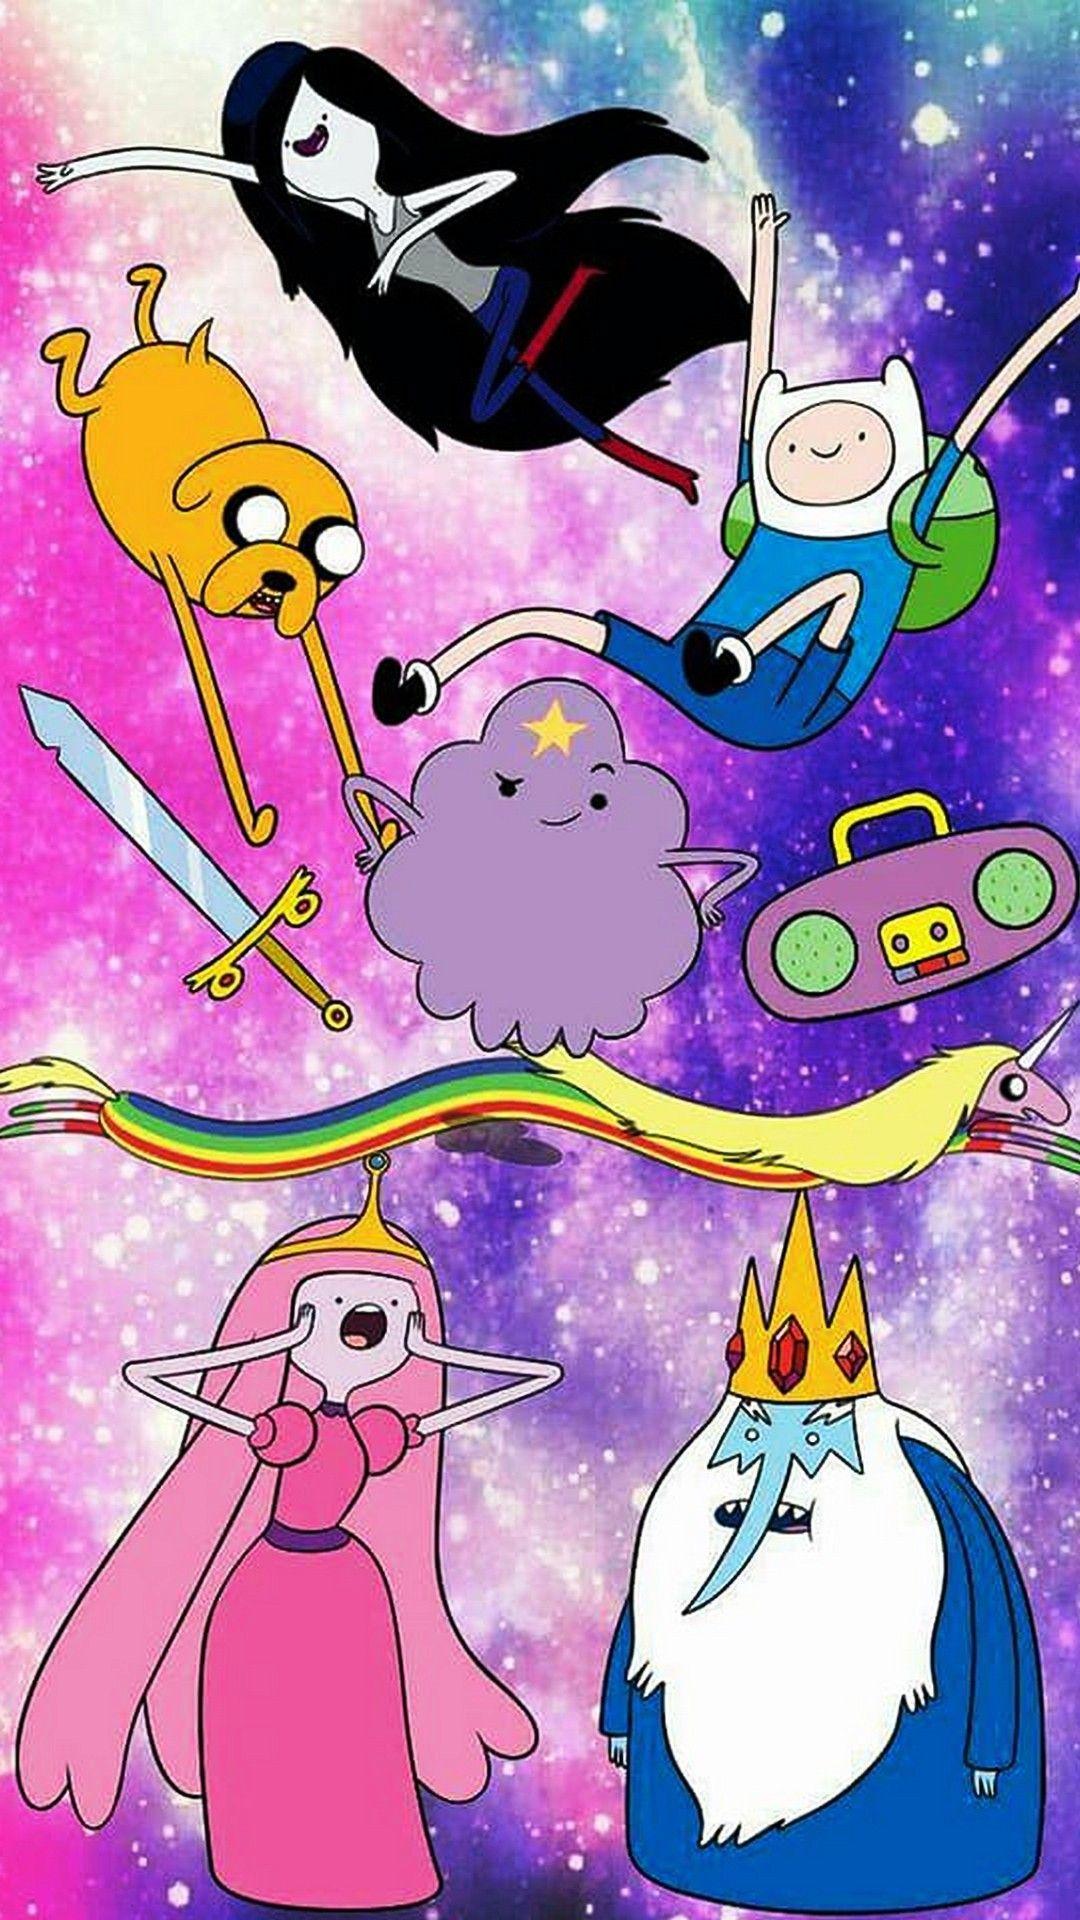 Adventure Time Iphone 6 Wallpaper Hd Best Phone Wallpaper Adventure Time Cartoon Adventure Time Wallpaper Adventure Time Characters